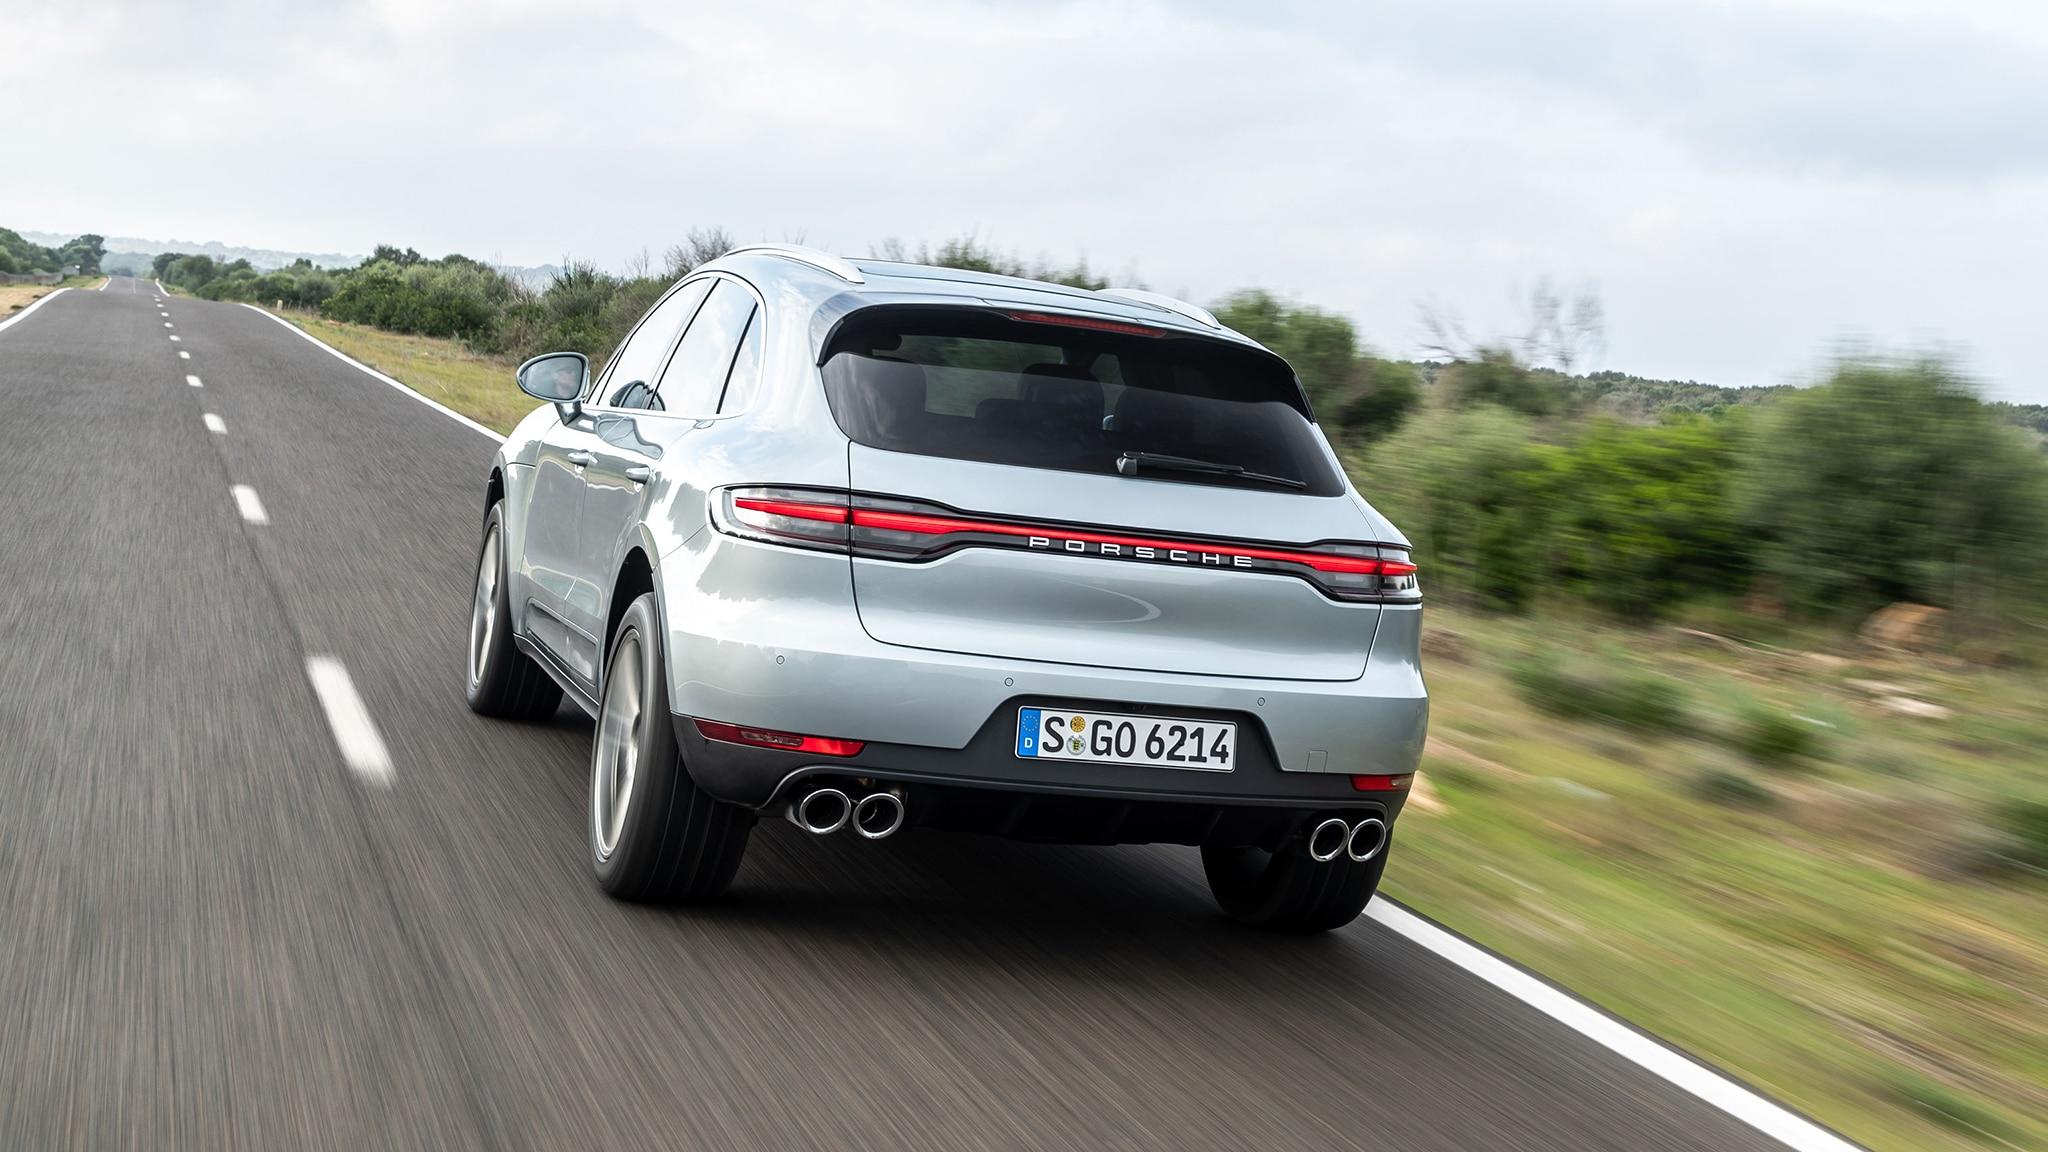 Un Nouveau Suv Sportif Le Porsche Macan S Le Mag Auto Prestige